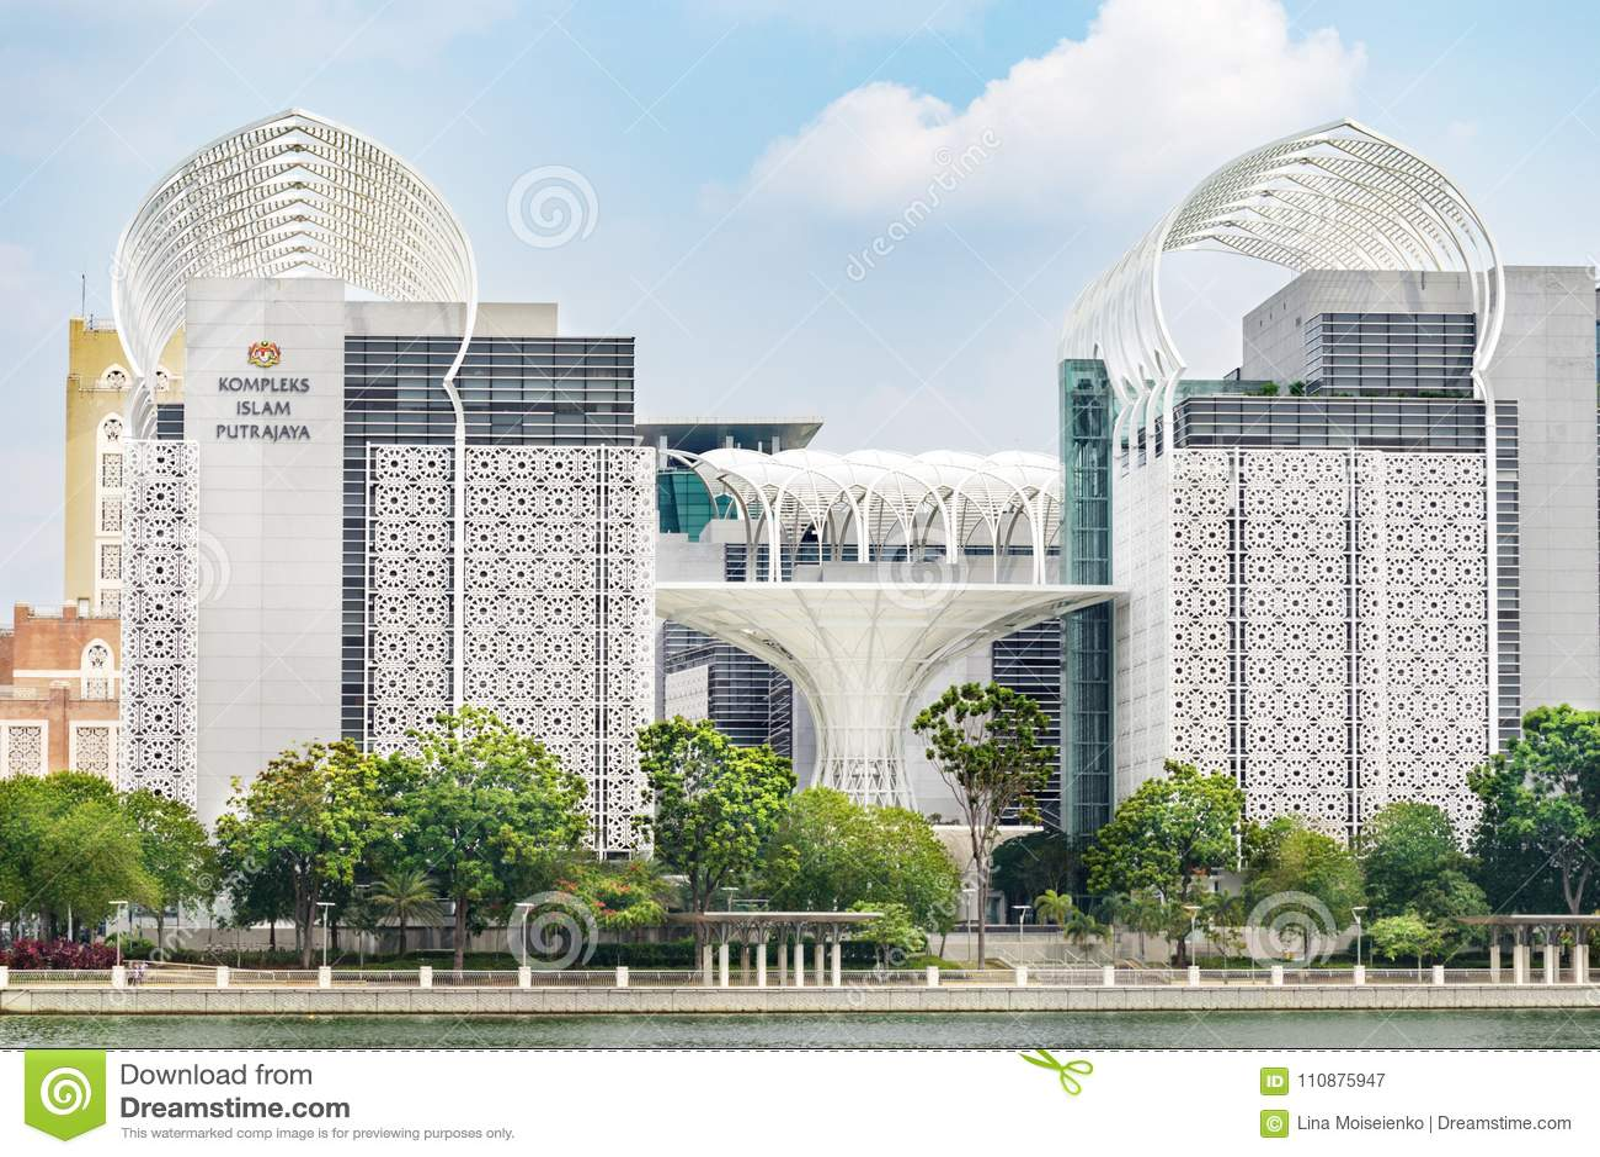 Kompleks Islam Putrajaya Beautiful Modern Urban Architecture